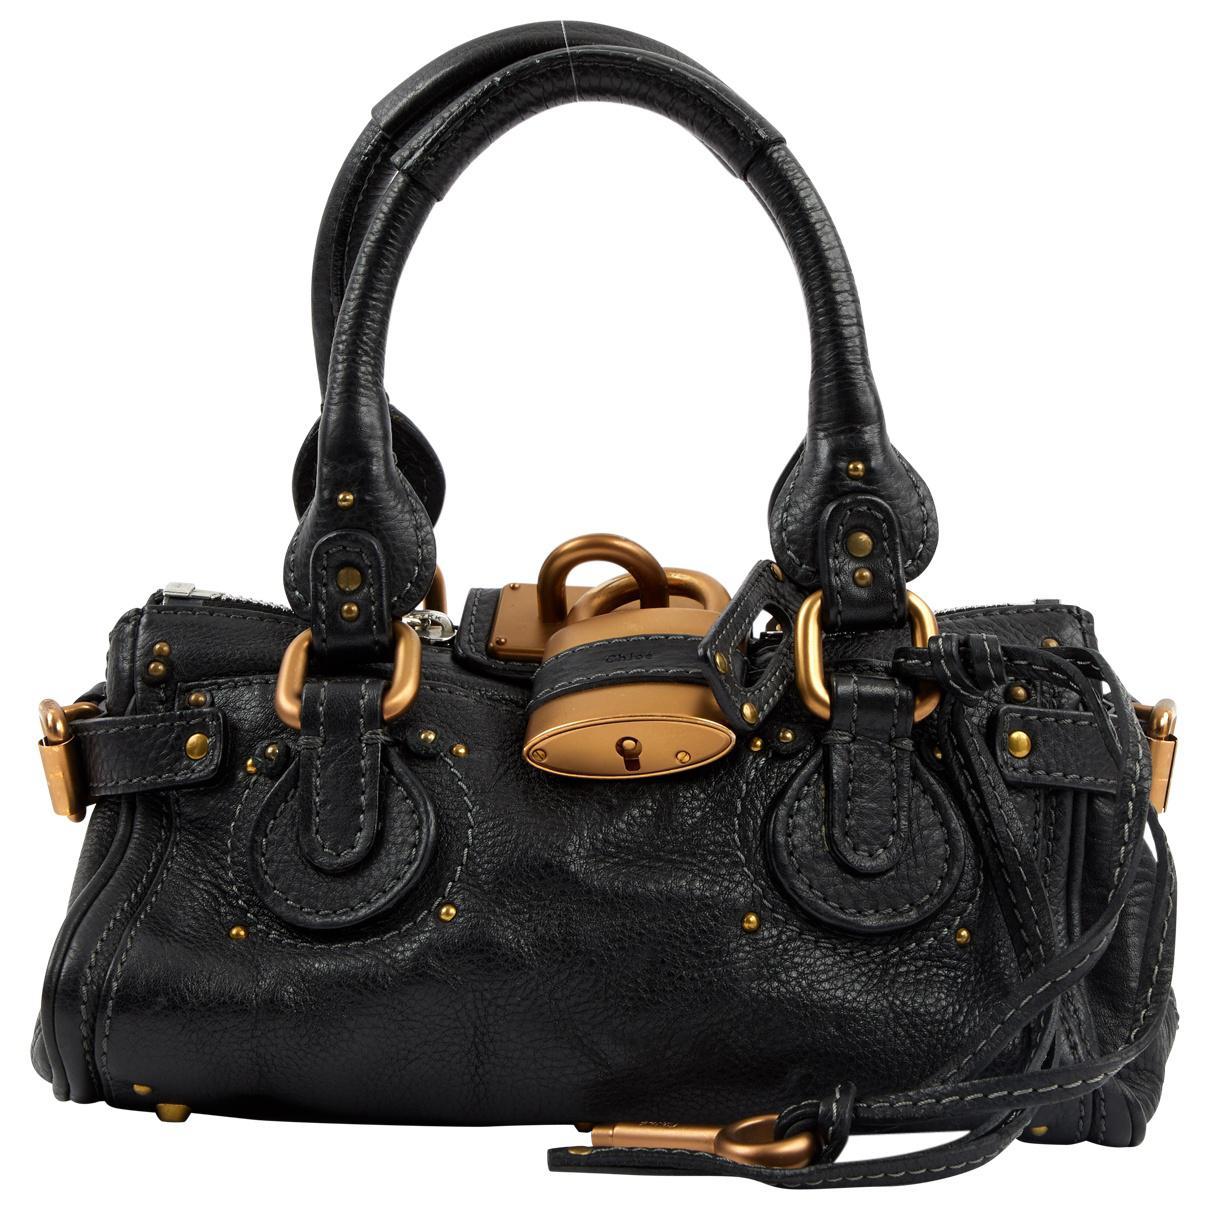 818e8a641f67 Chloé Paddington Leather Bag in Black - Lyst